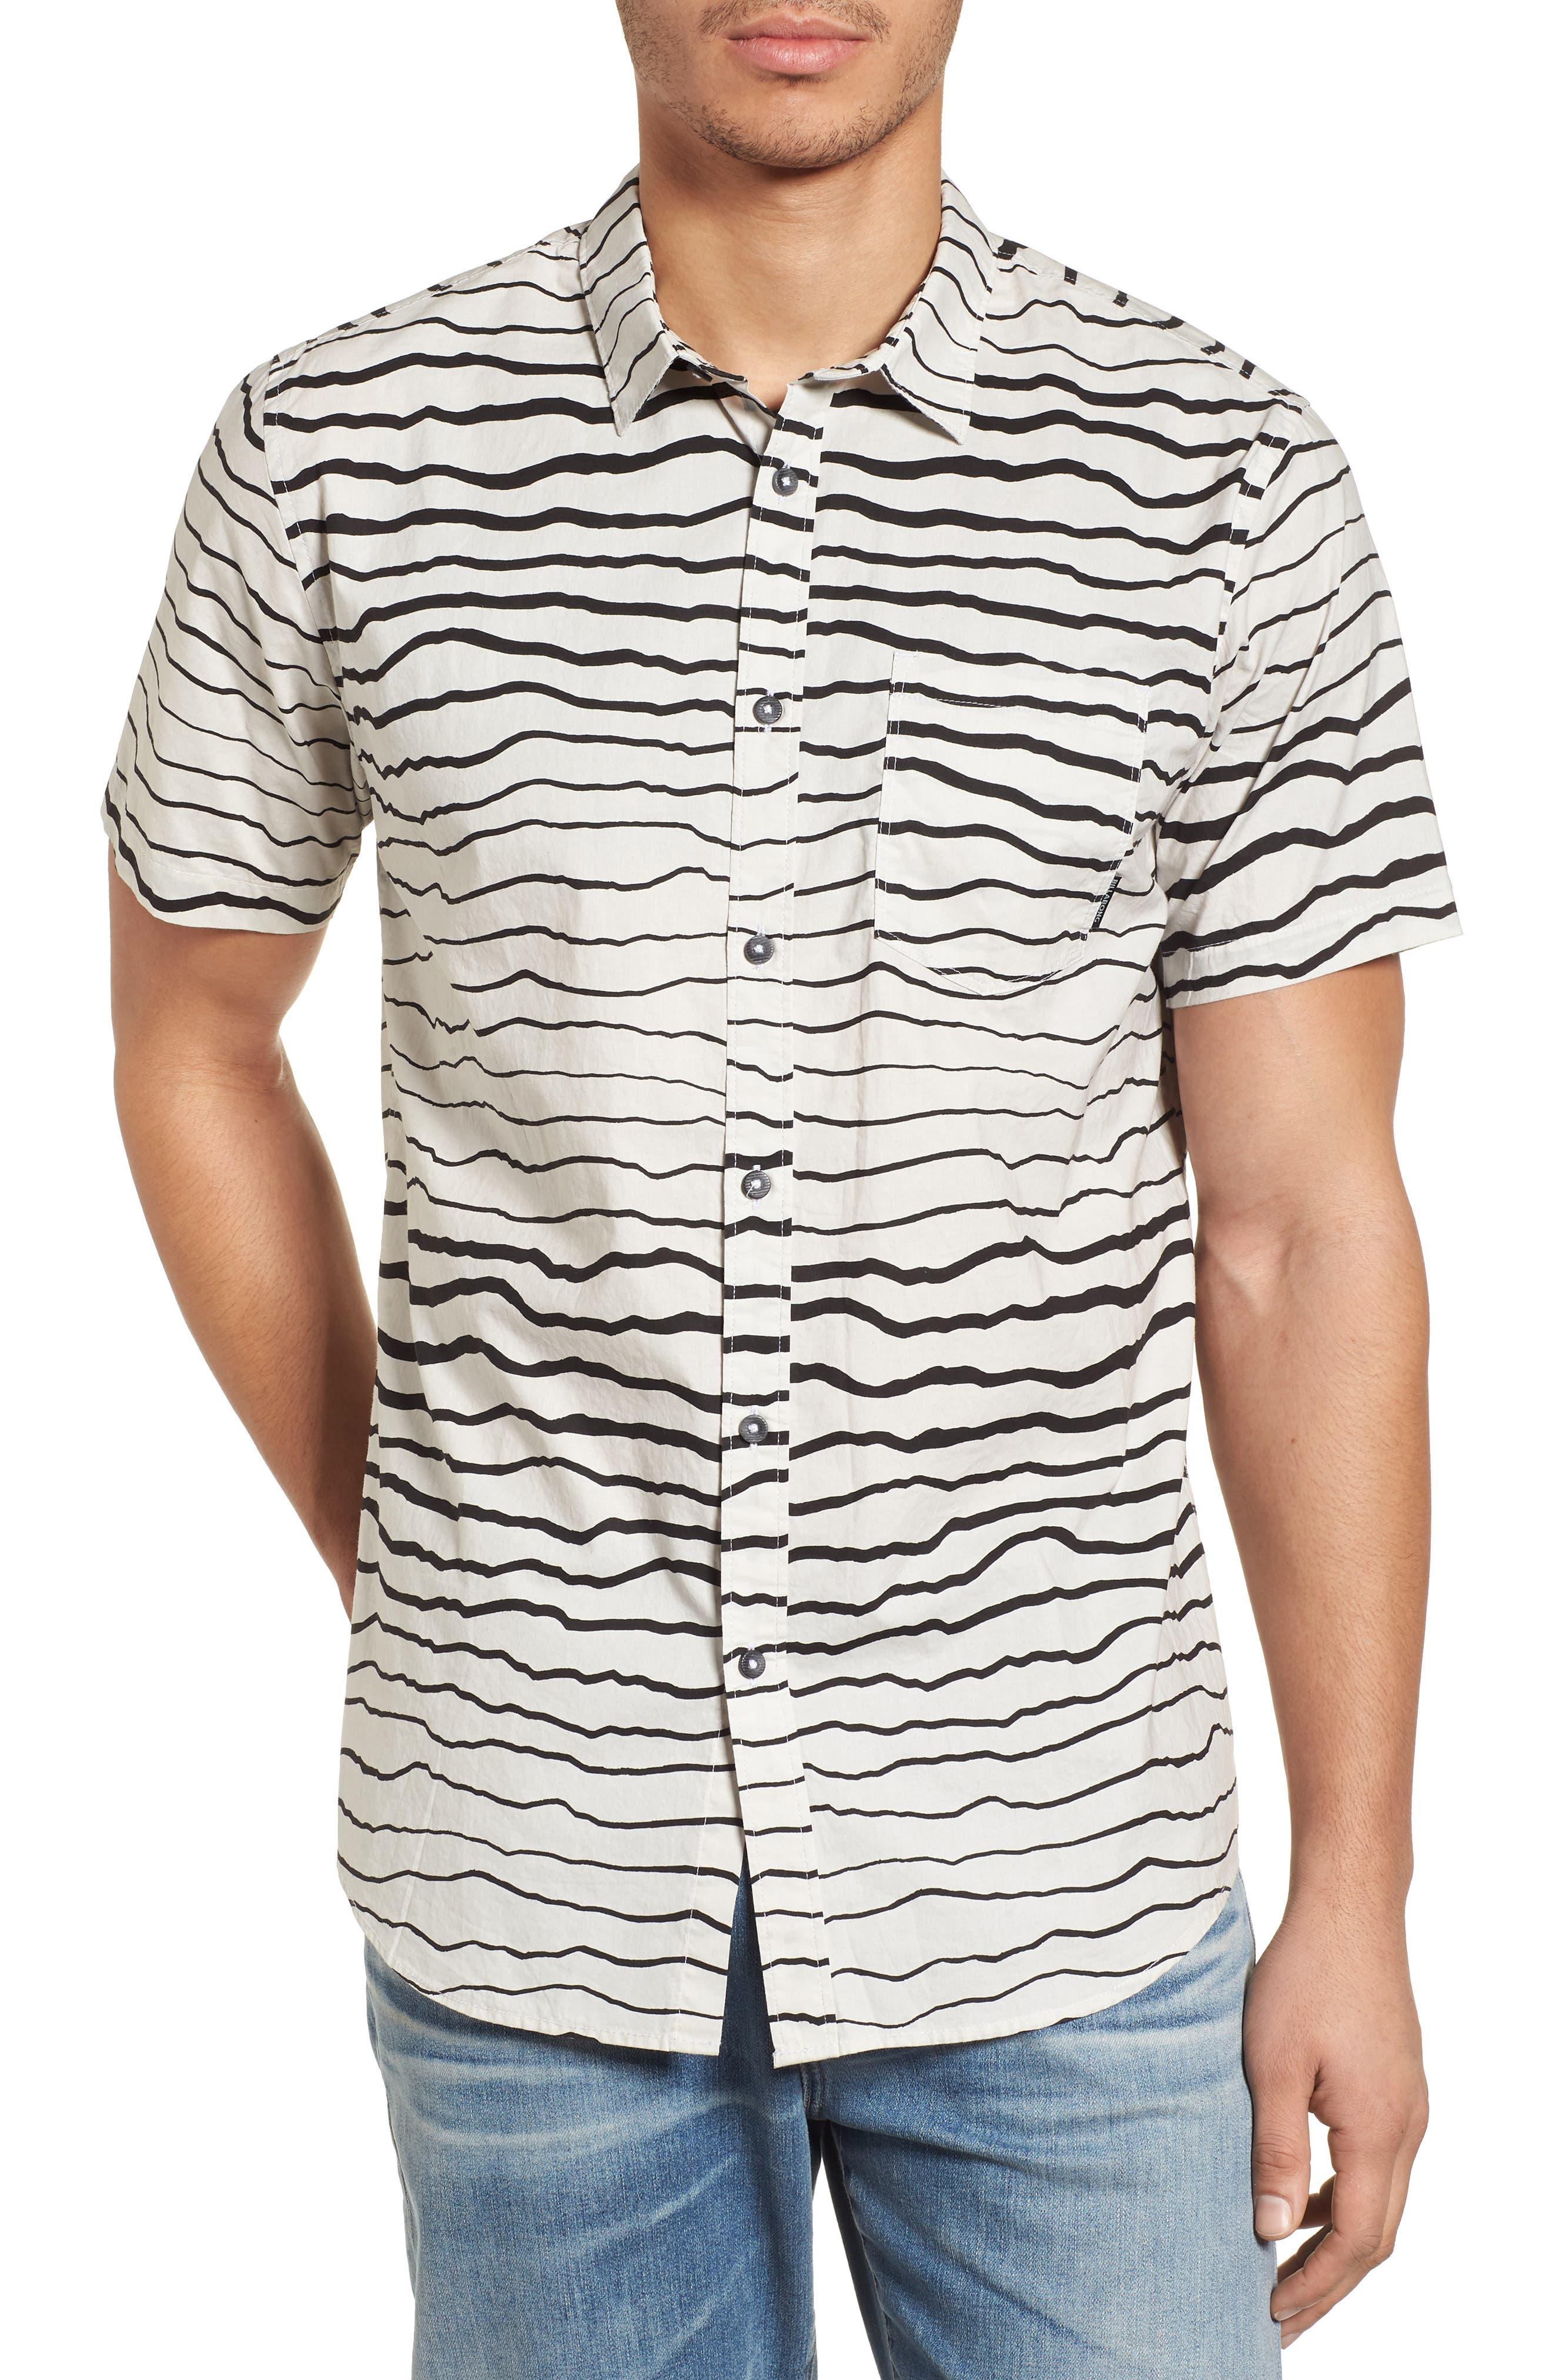 Sundays Lines Shirt,                         Main,                         color, Stone